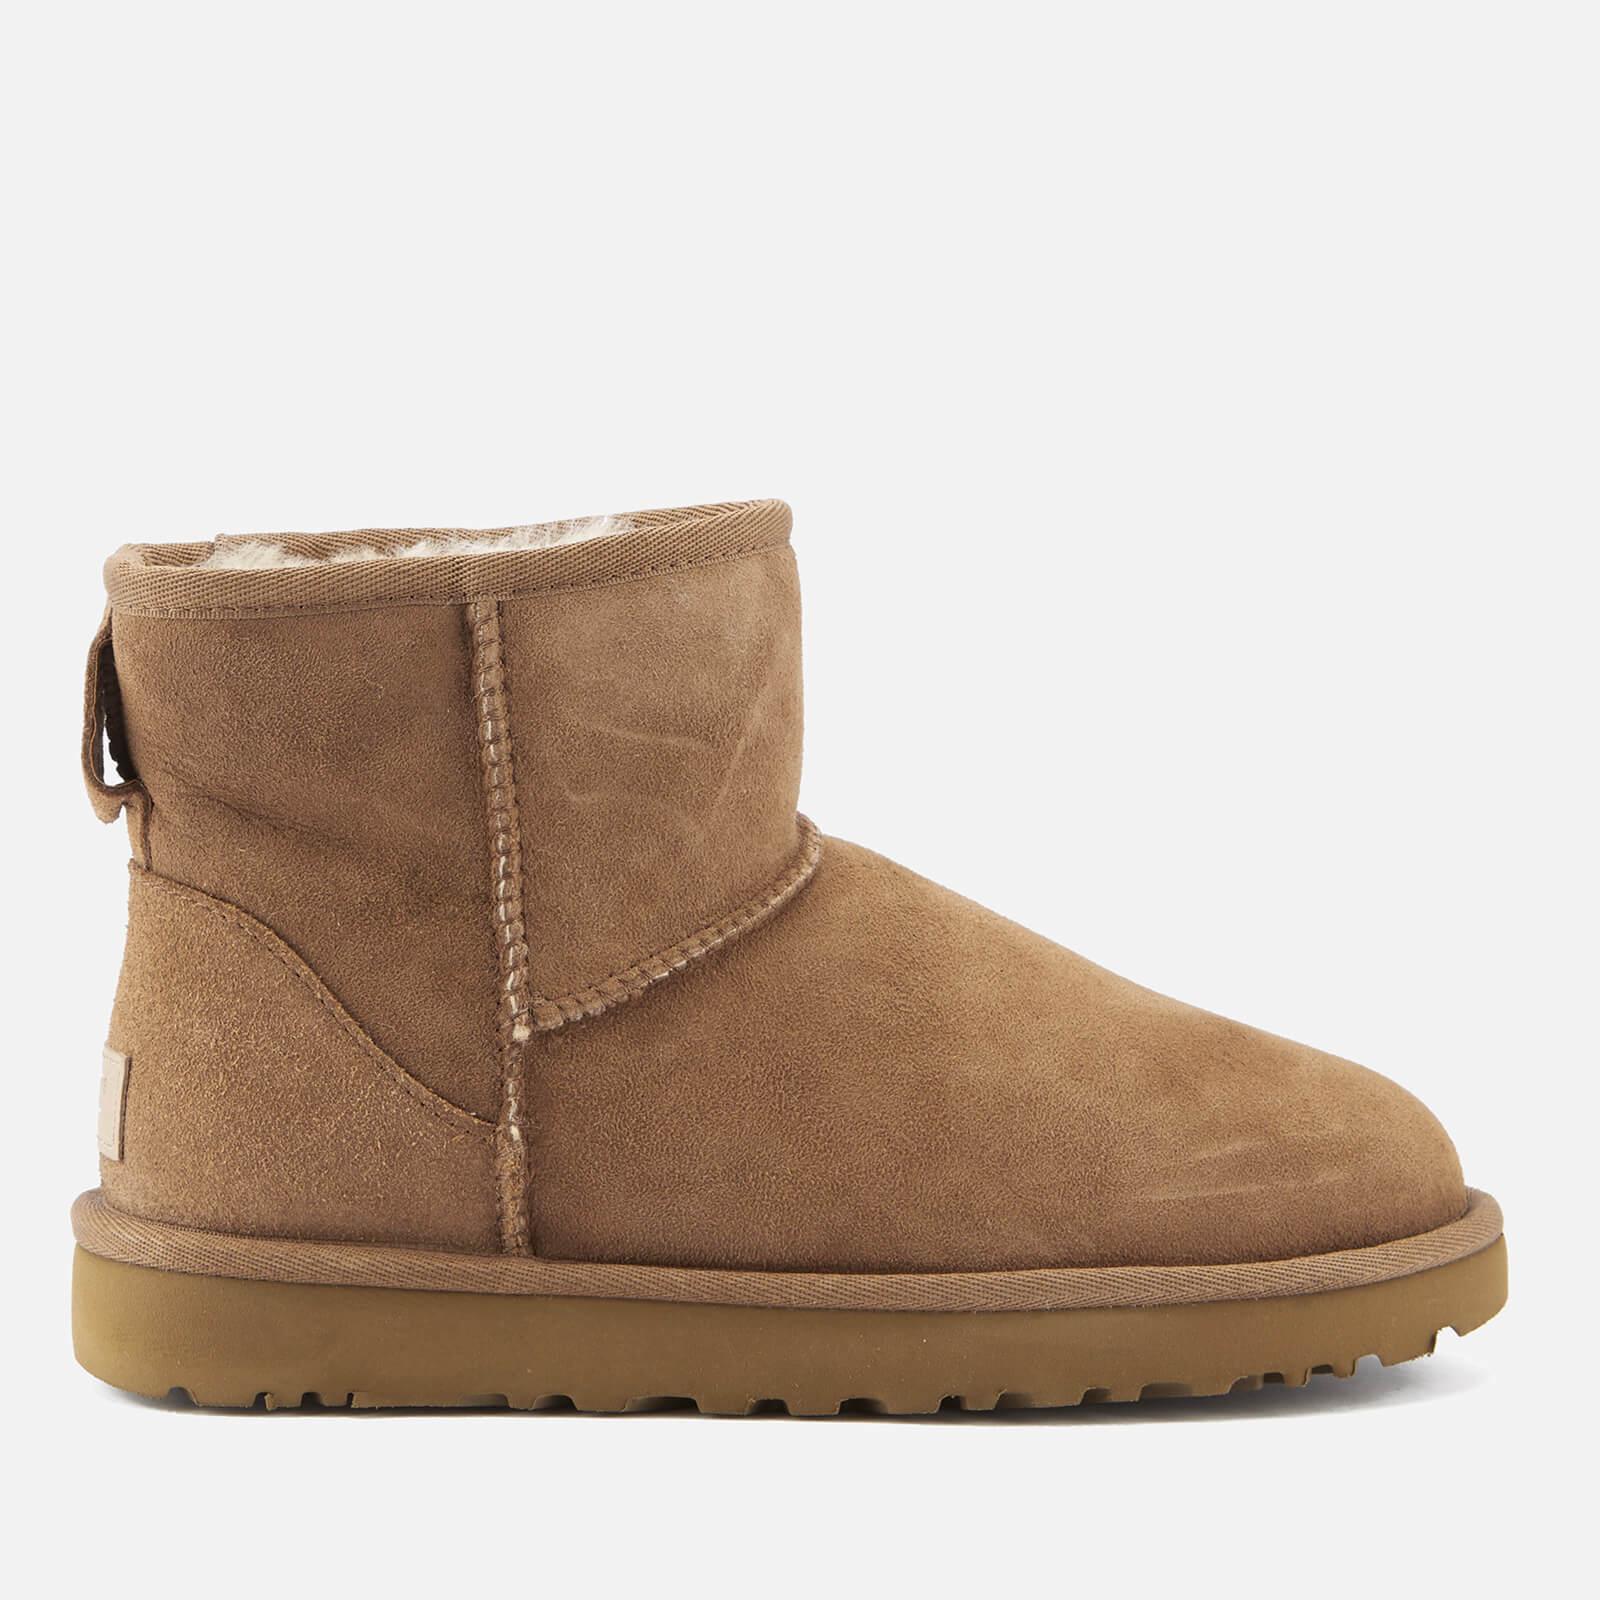 781416e3079 UGG Women's Classic Mini II Sheepskin Boots - Chestnut